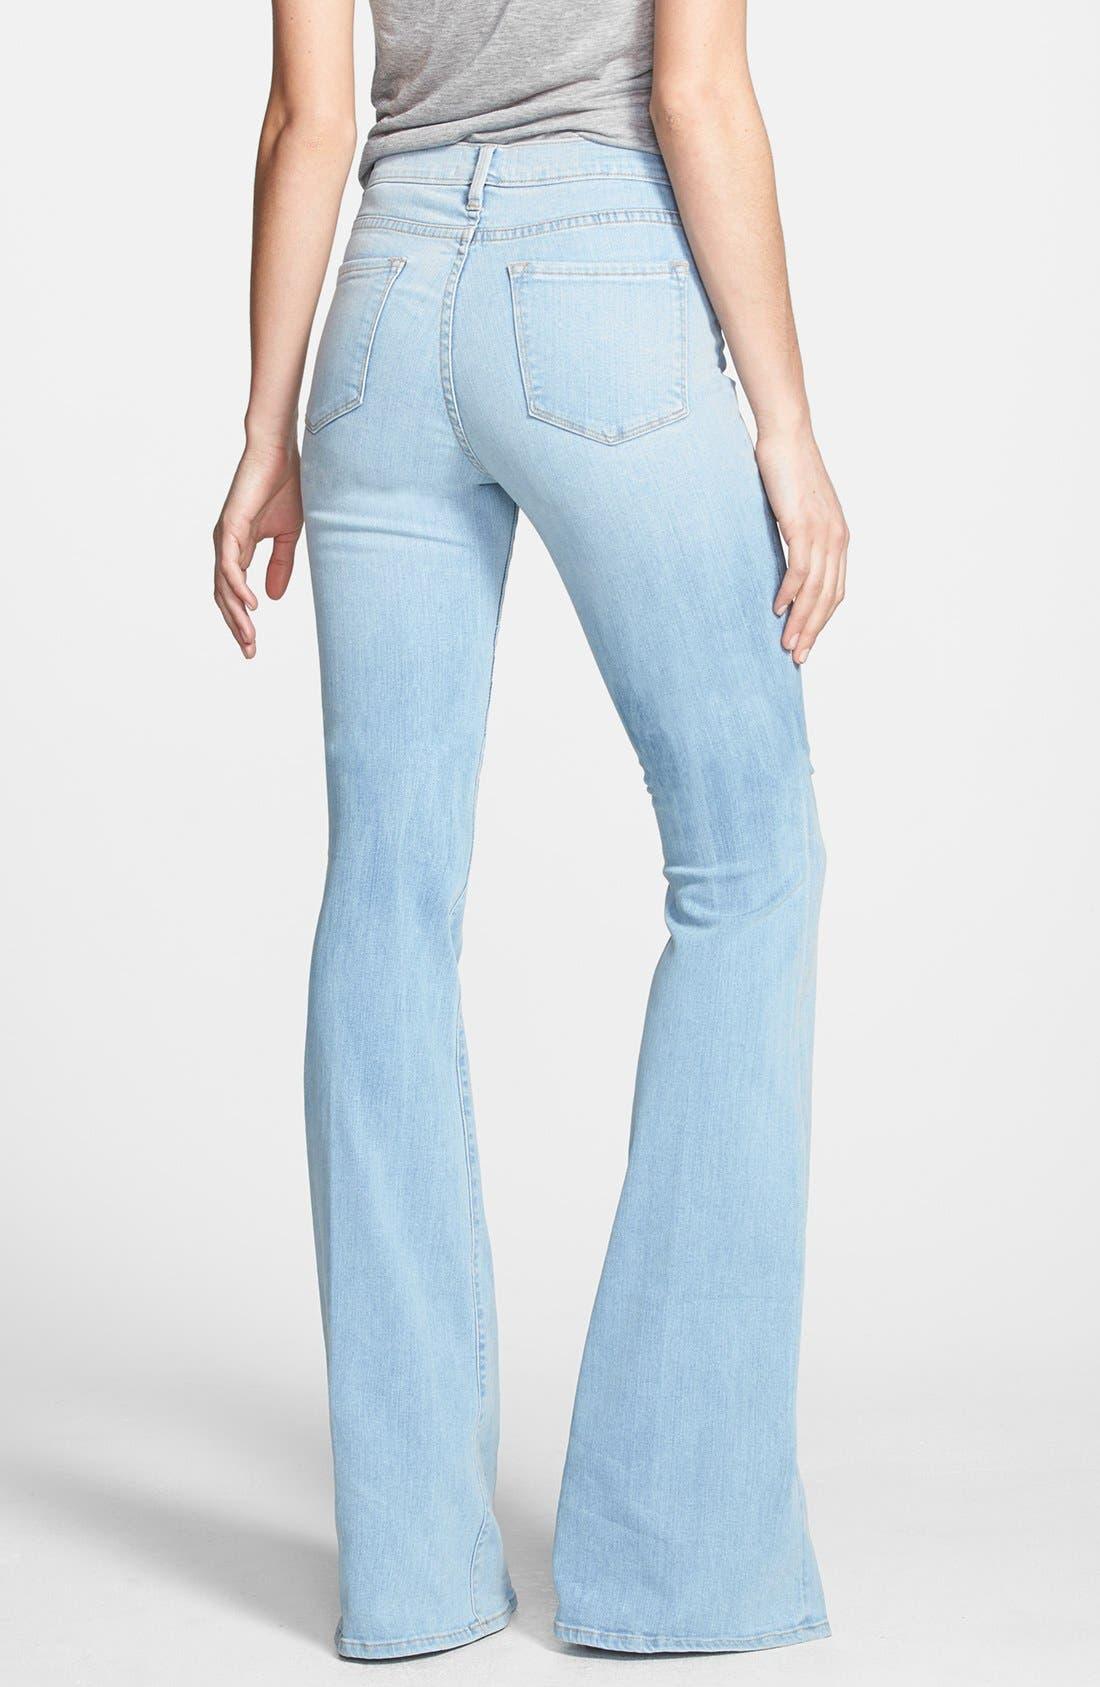 Alternate Image 3  - Frame Denim 'Forever Karlie' Flared Jeans (Redchurch Street)